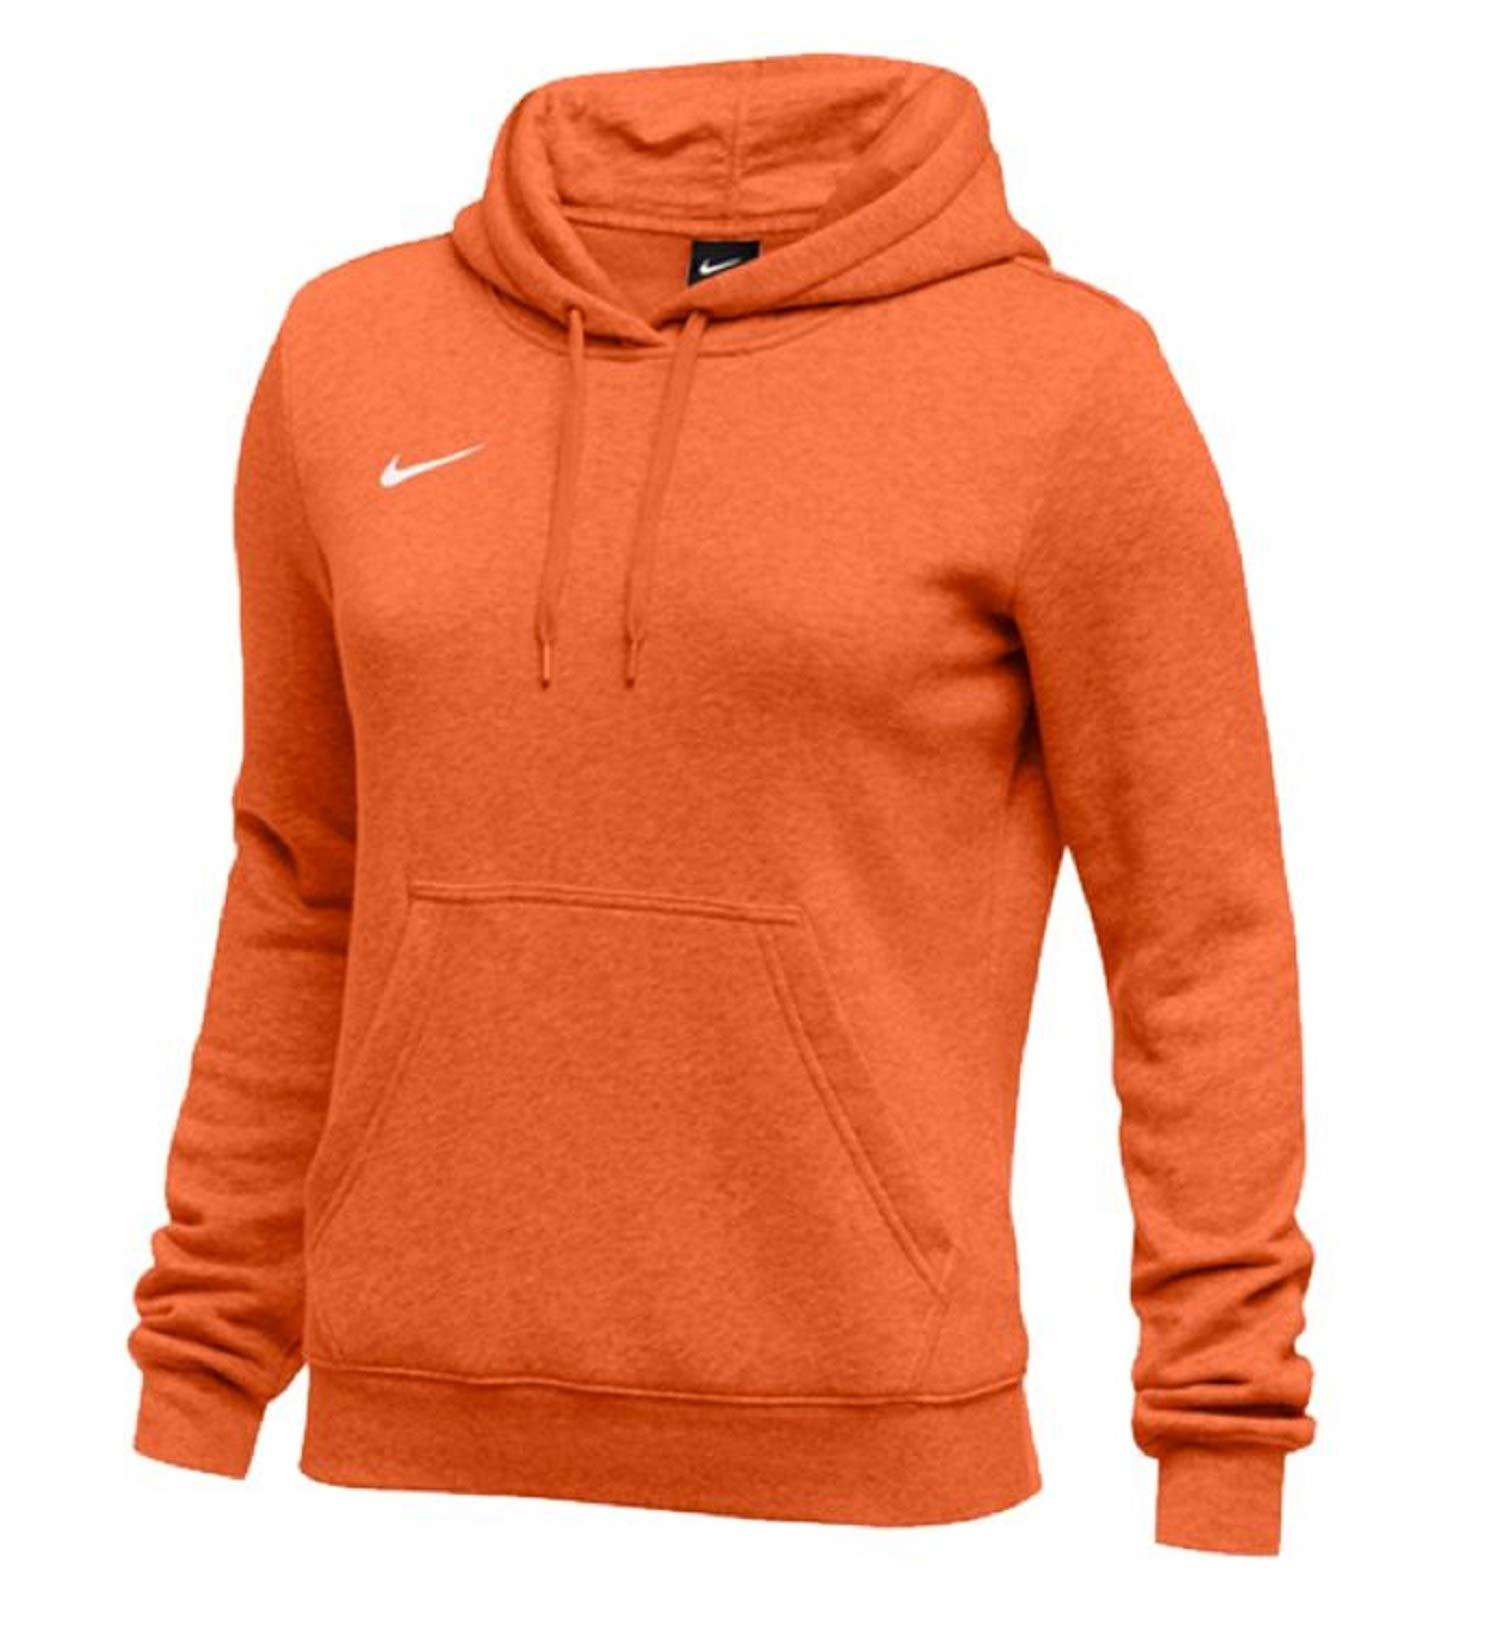 Nike Womens Pullover Club Fleece Hoodie (Small, Orange) by Nike